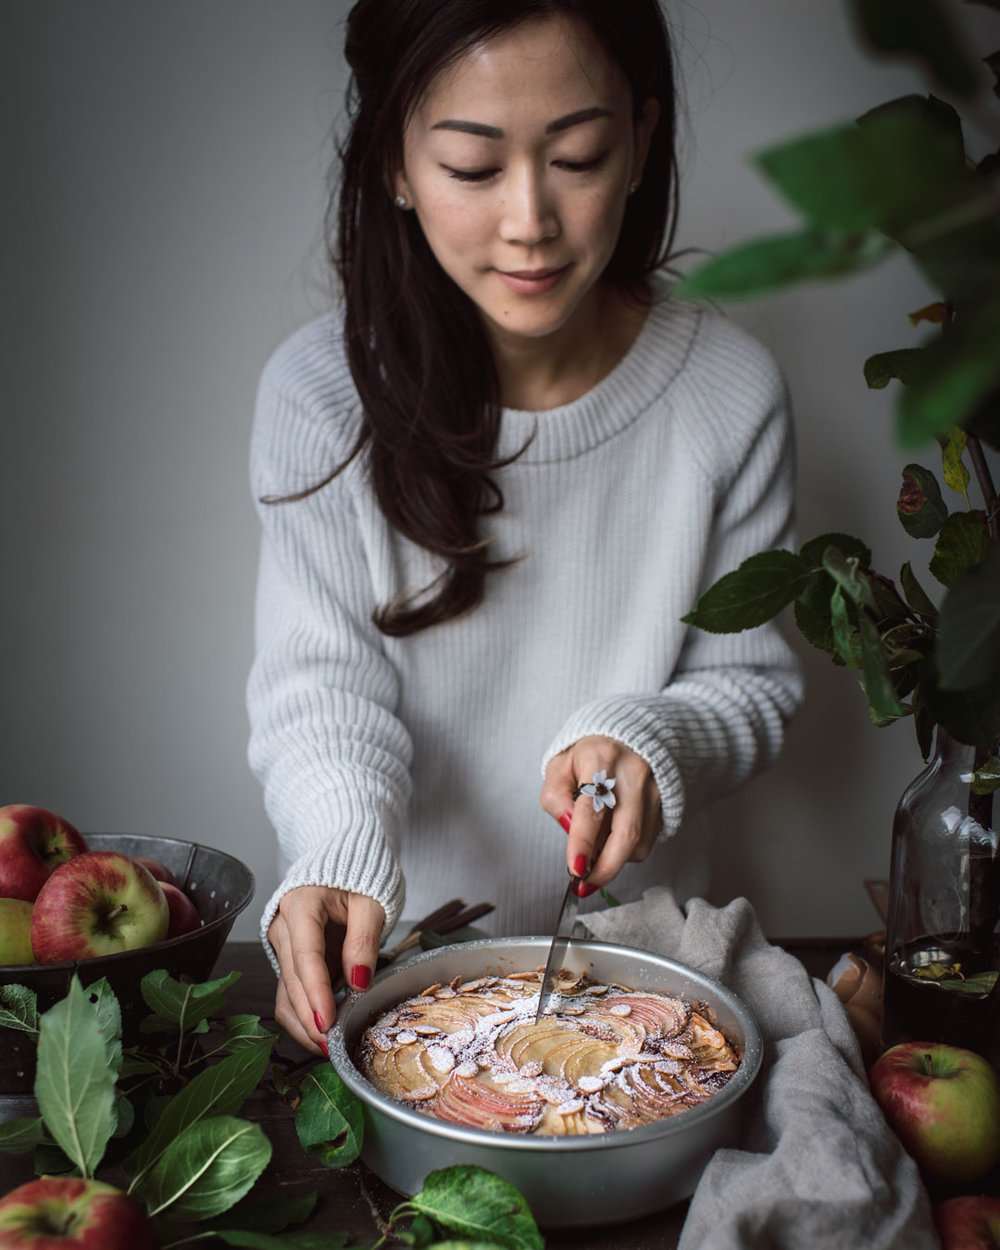 spiced apple cake 2-5392-3.jpg